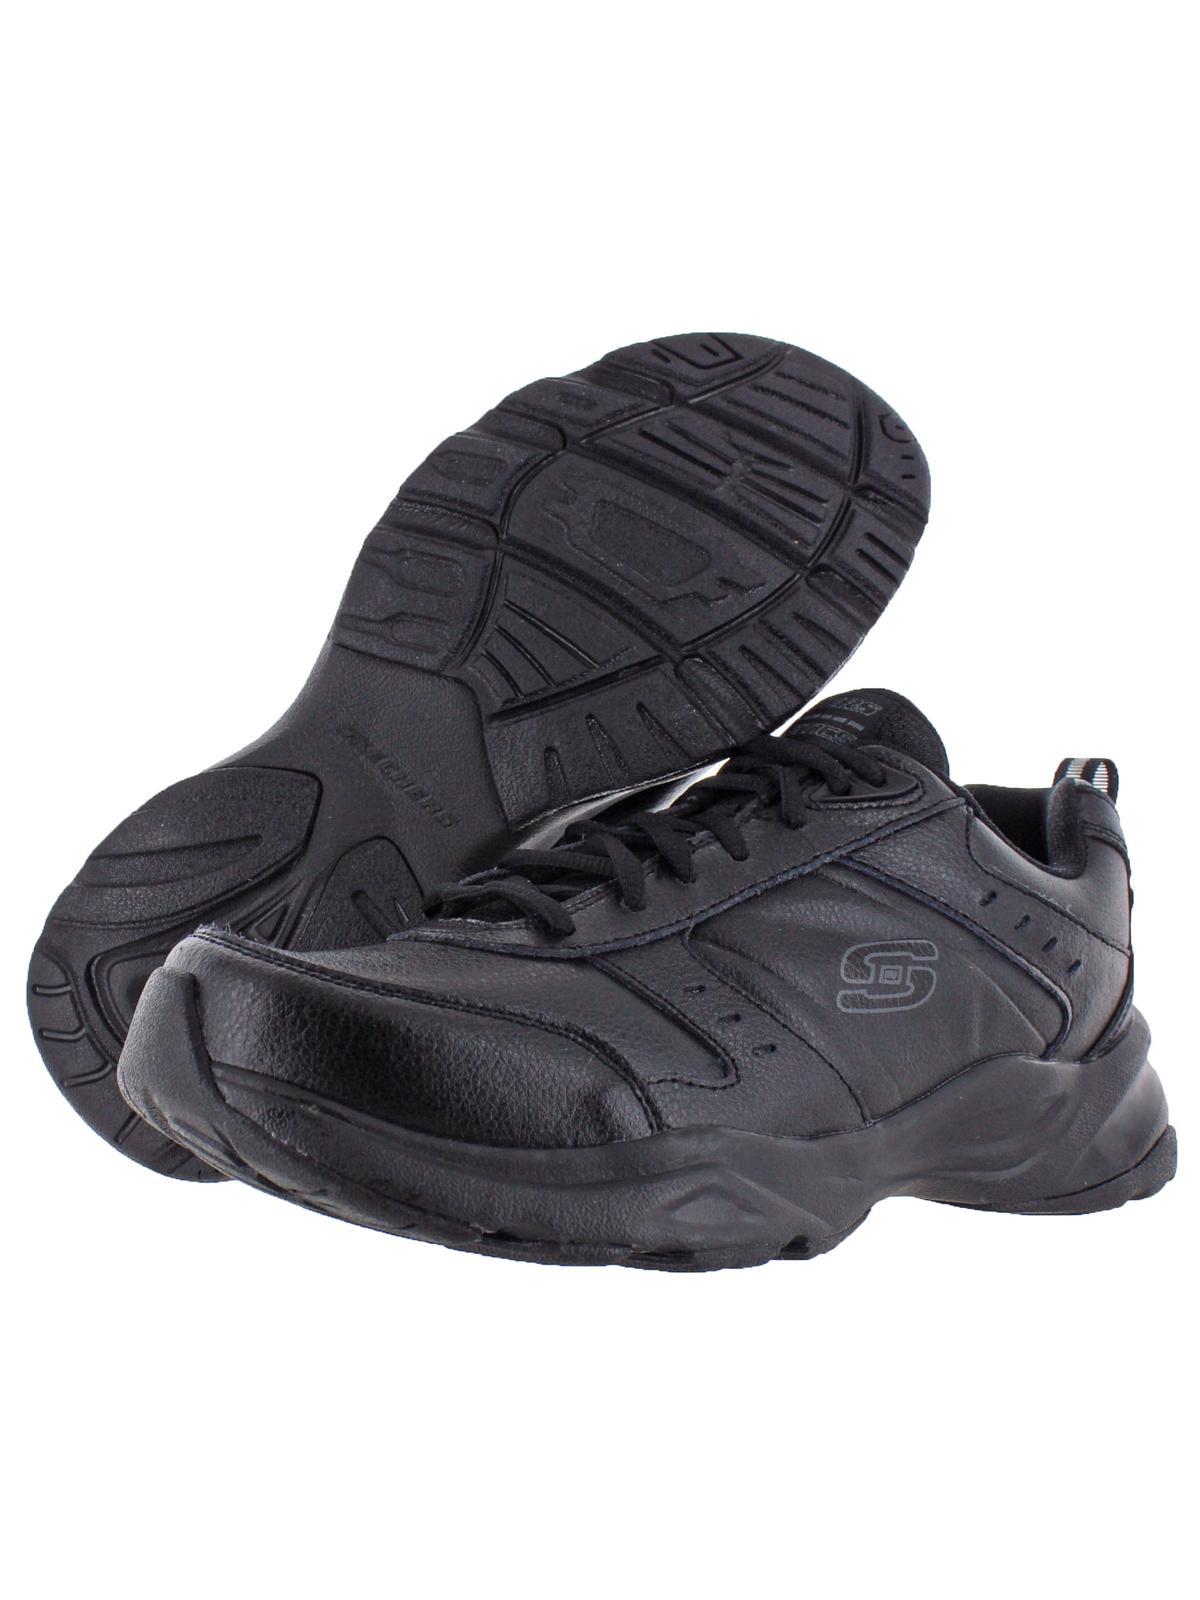 cojo Pórtico niebla  Skechers - Skechers Mens Haniger Leather Memory Foam Running Shoes -  Walmart.com - Walmart.com